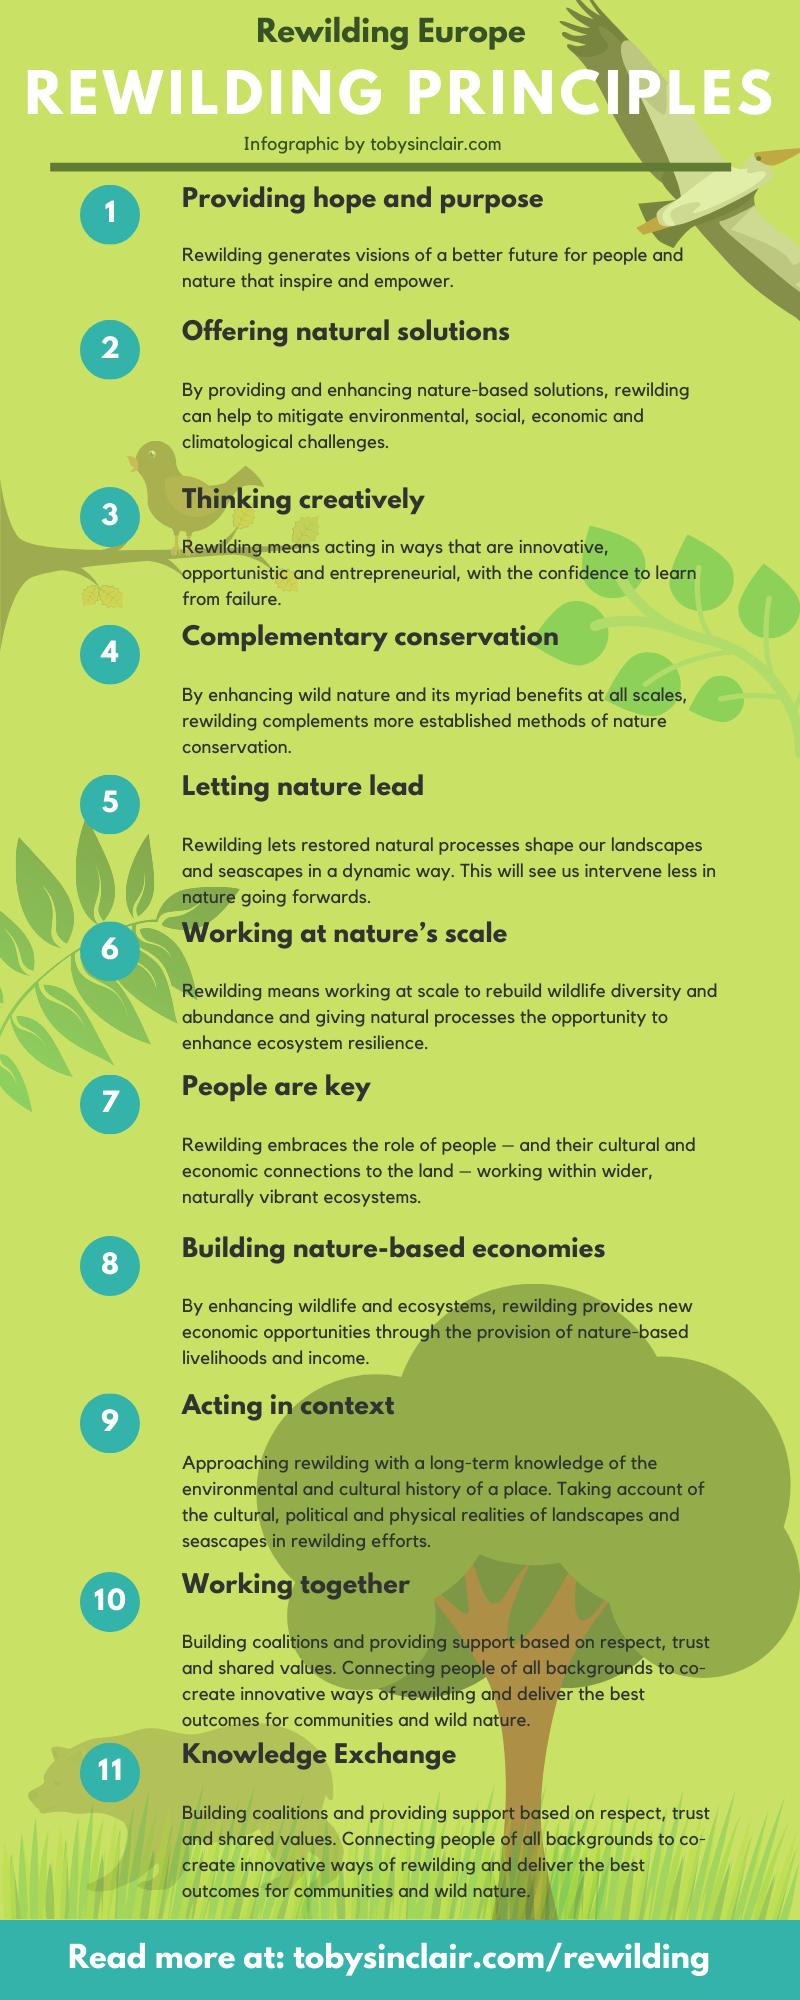 Rewilding Principles Infographic - Rewilding Europe